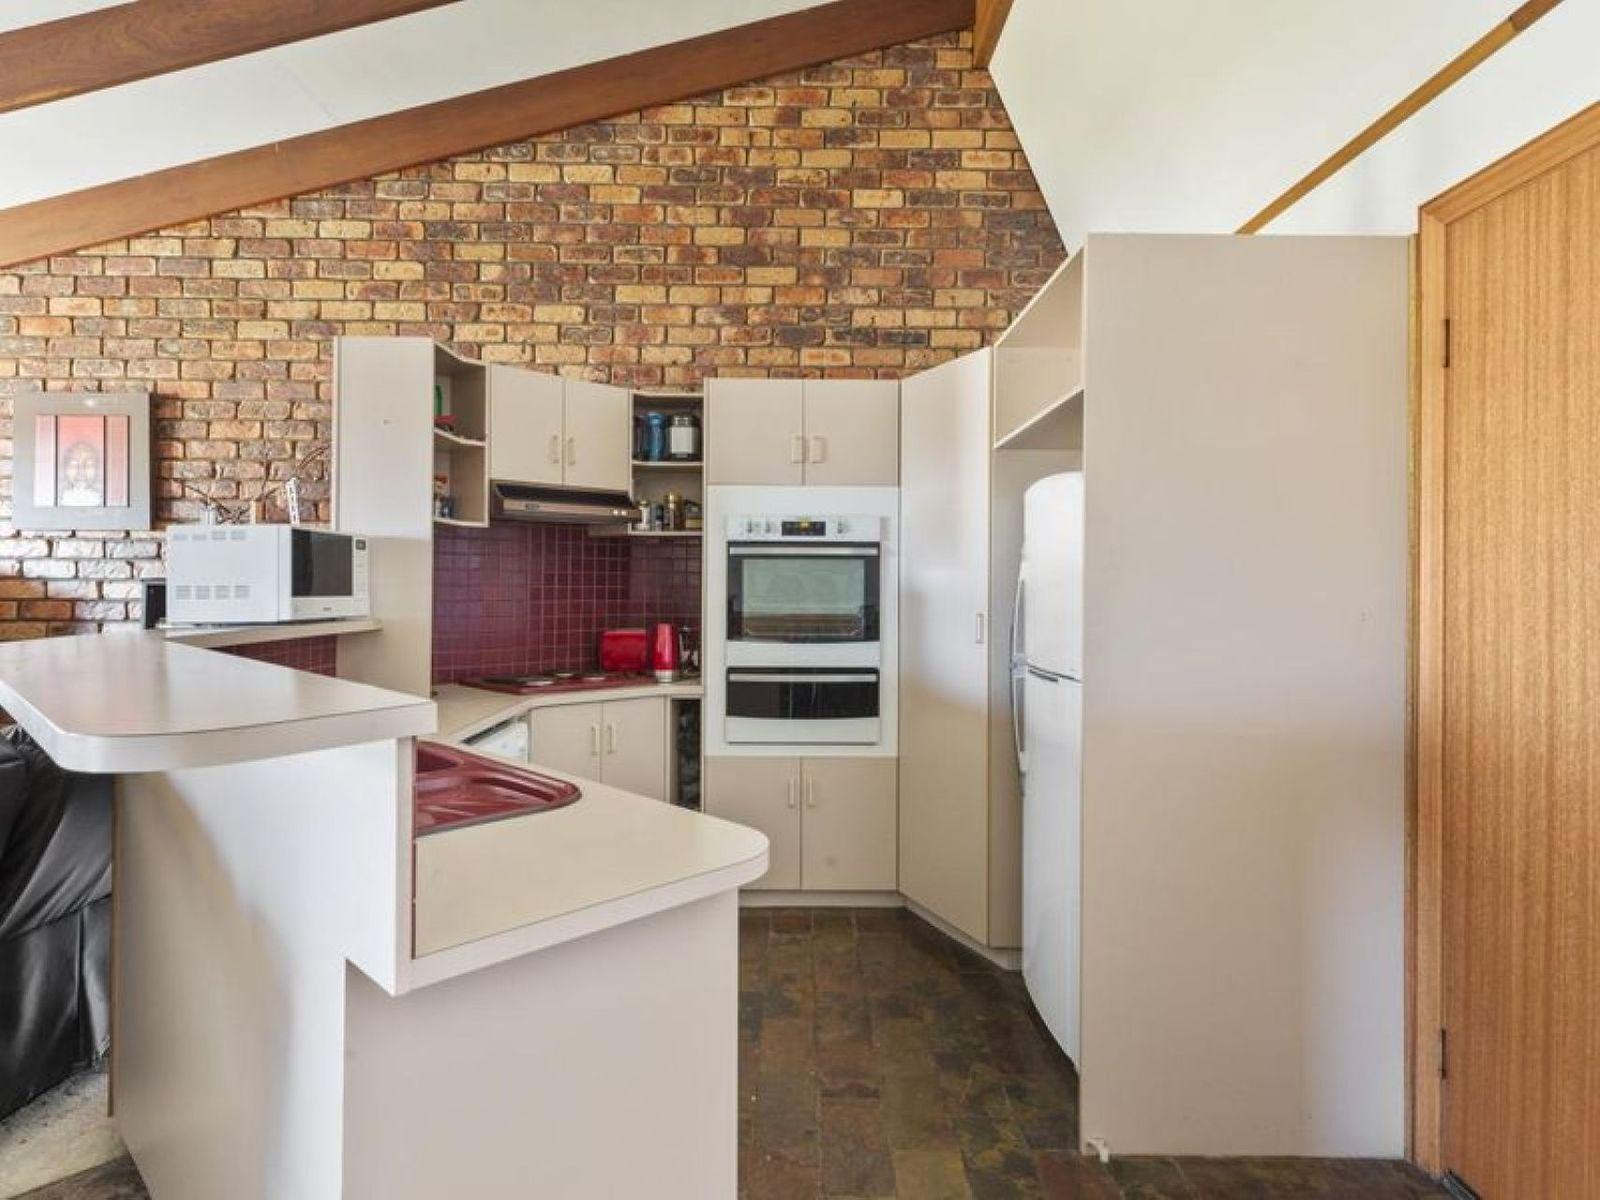 2/377 Alderley Street, South Toowoomba, QLD 4350